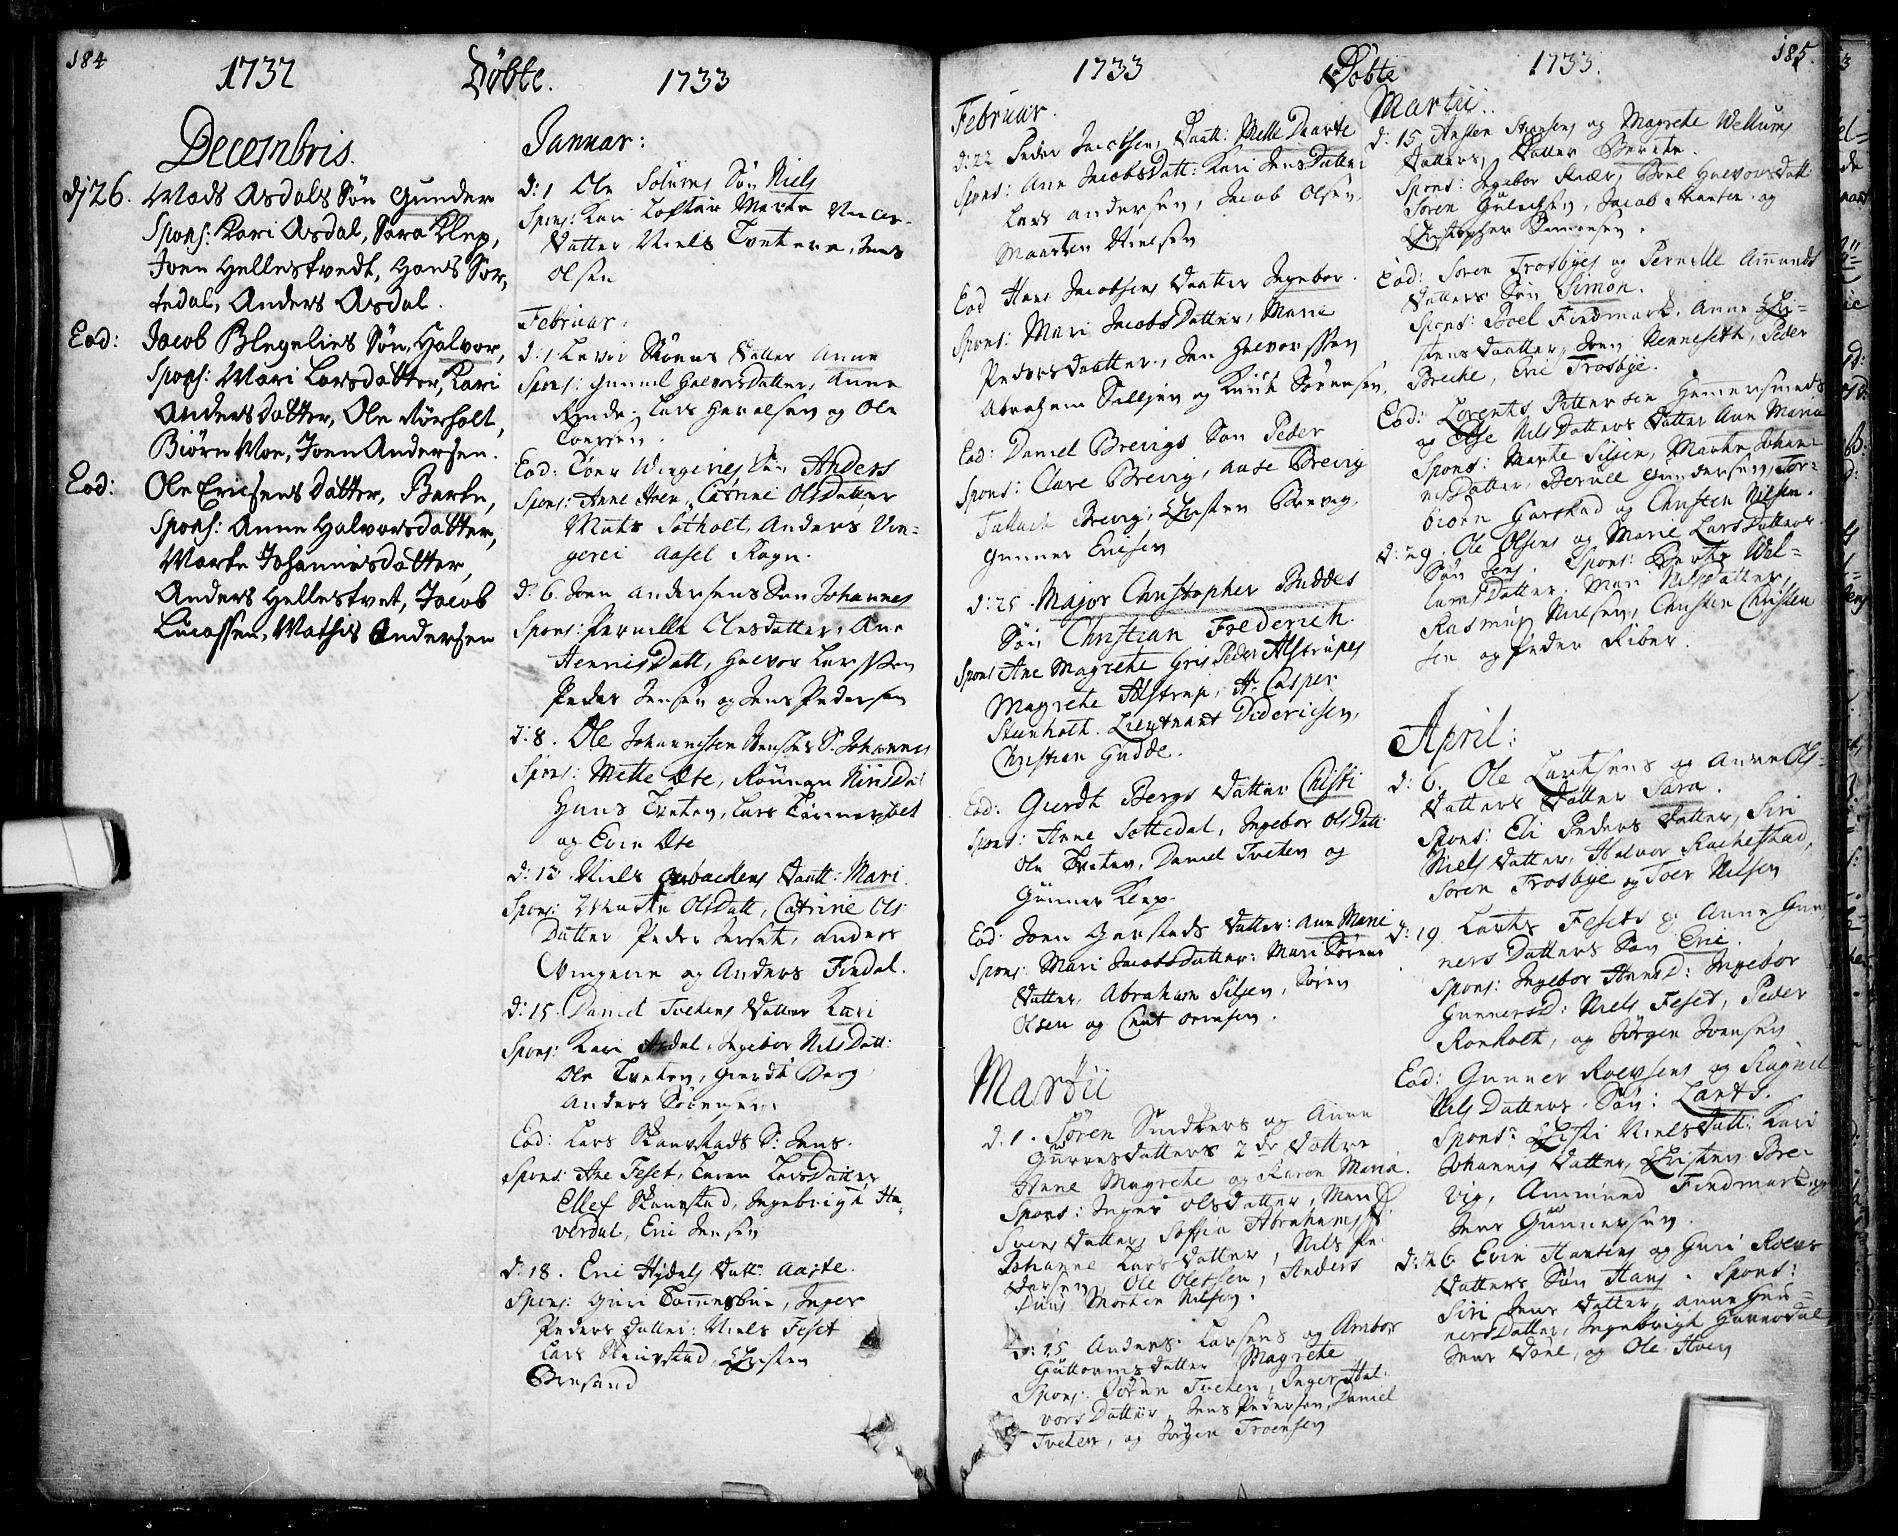 SAKO, Bamble kirkebøker, F/Fa/L0001: Ministerialbok nr. I 1, 1702-1774, s. 184-185